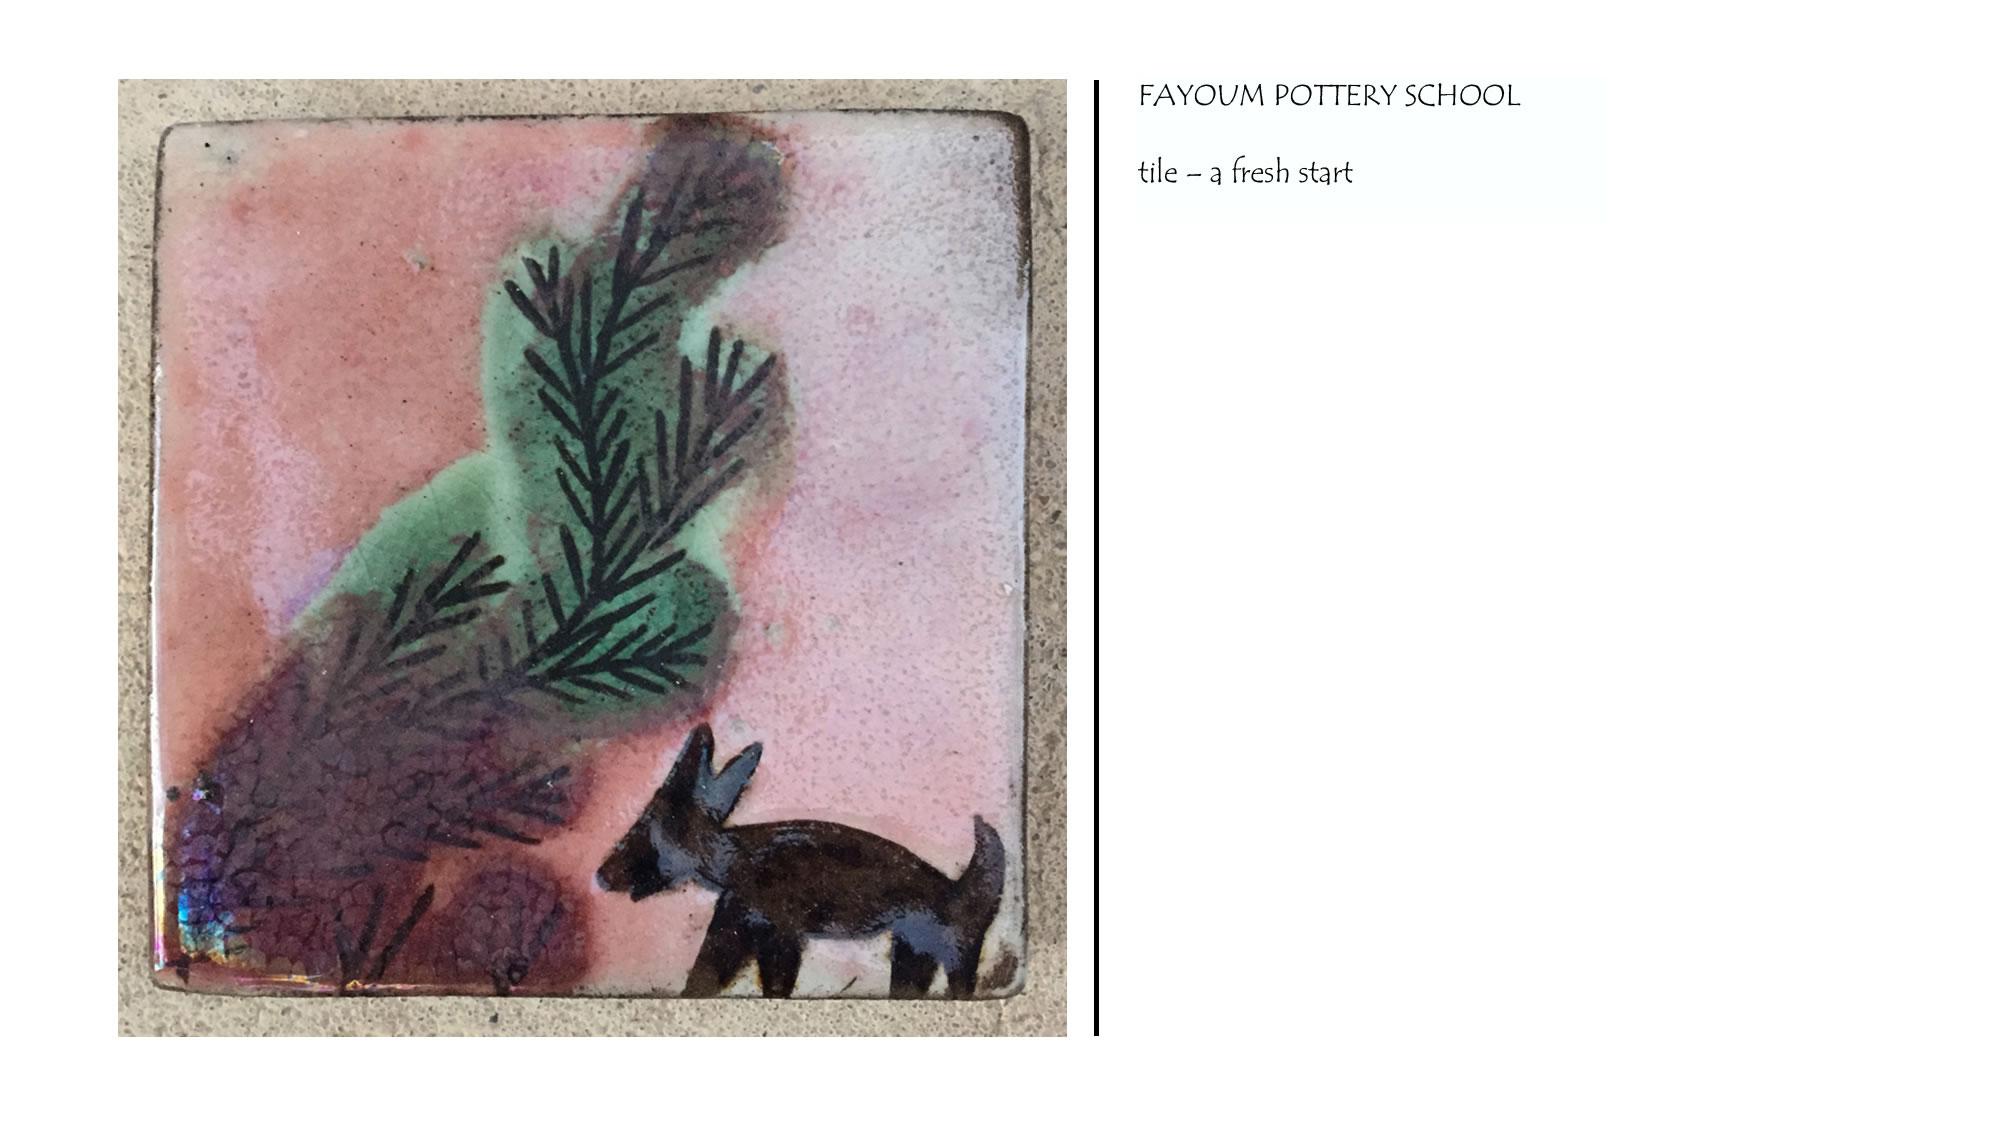 fayoum-pottery-school-10.jpg